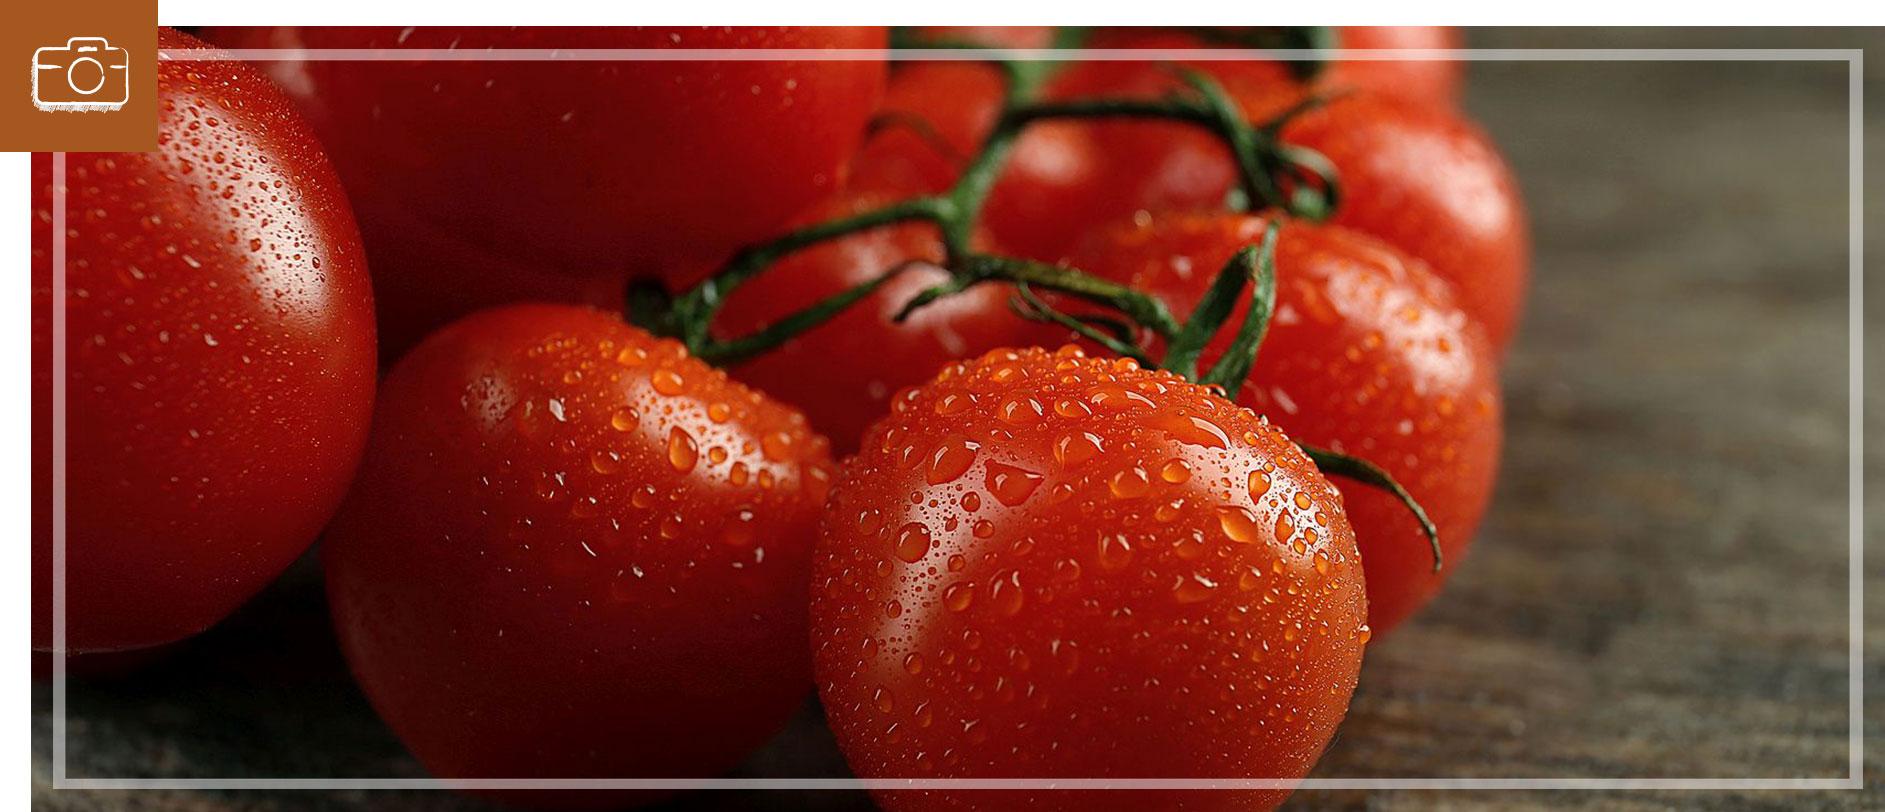 Food_Photo_PL_bnr5